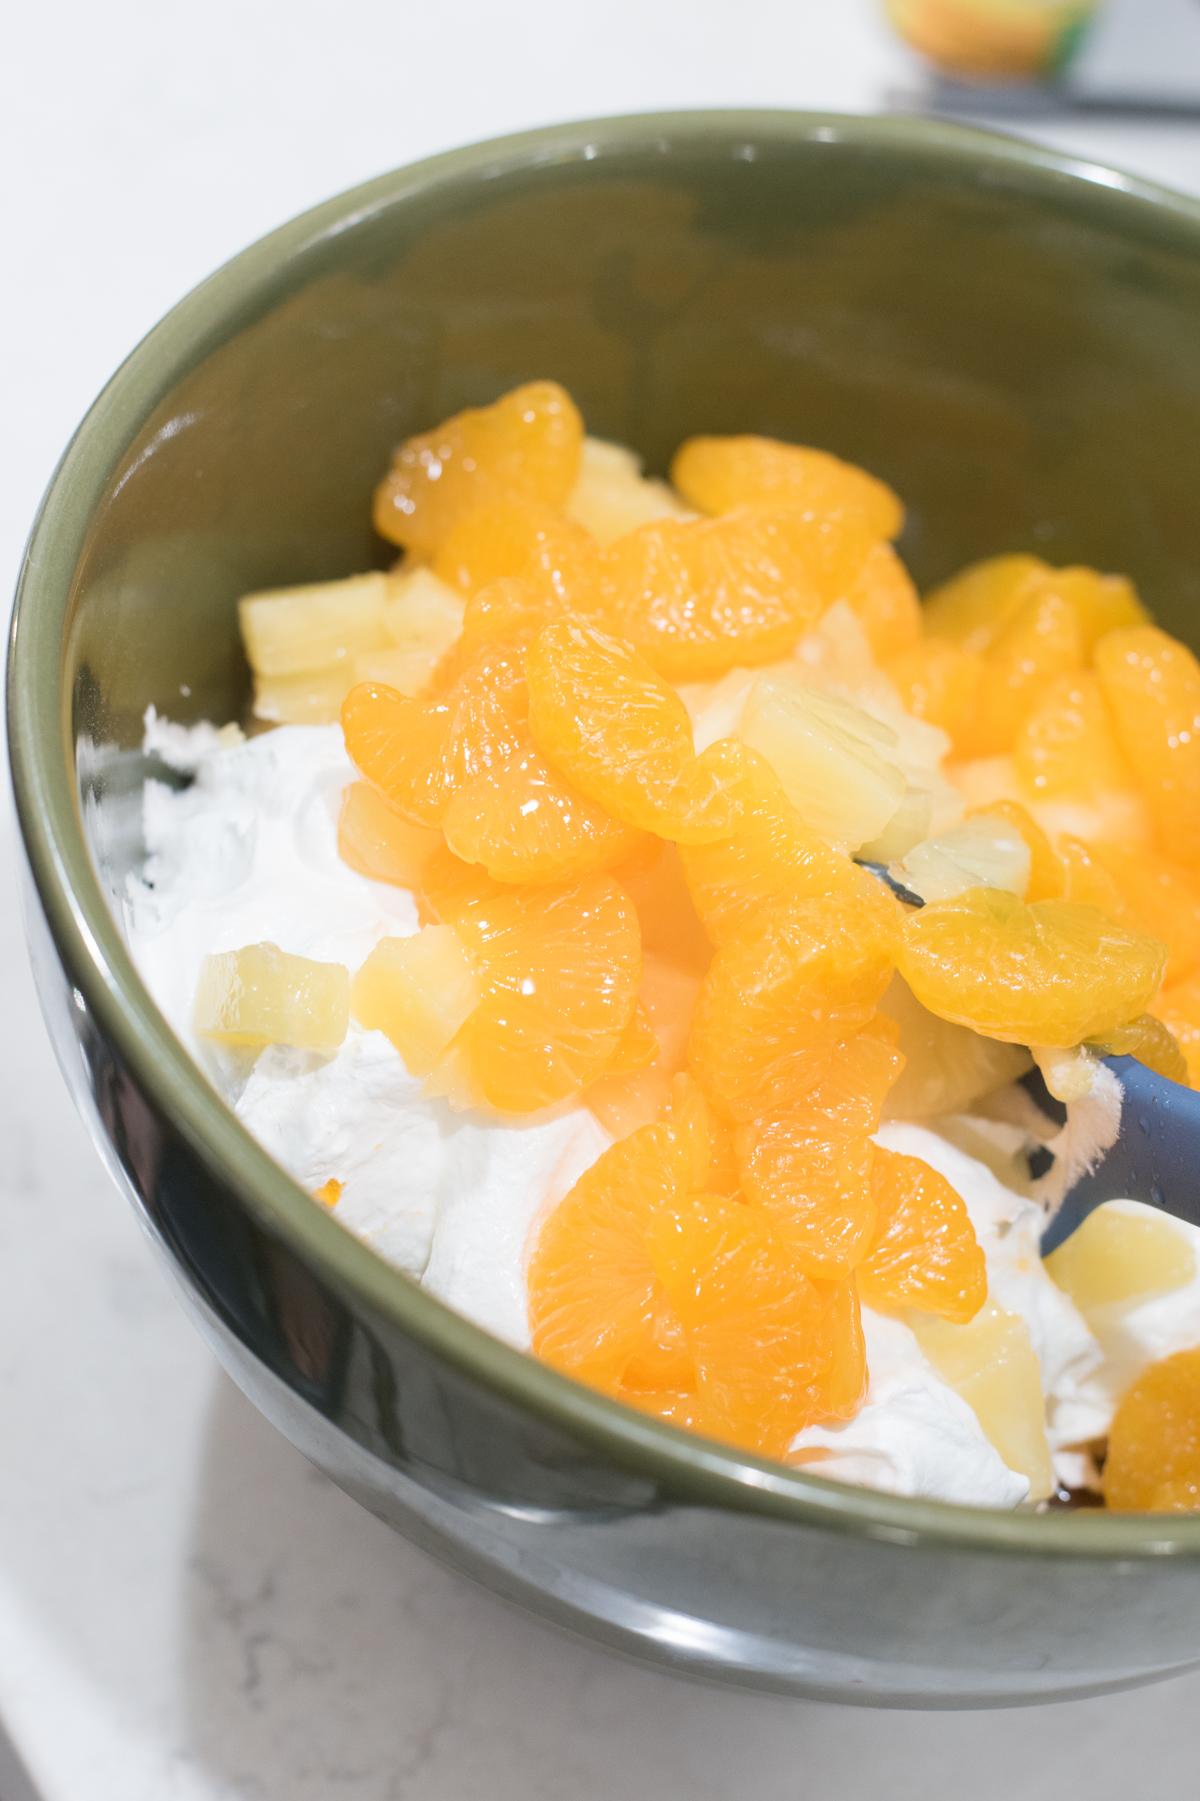 orange jello with mandarin oranges and pineapple